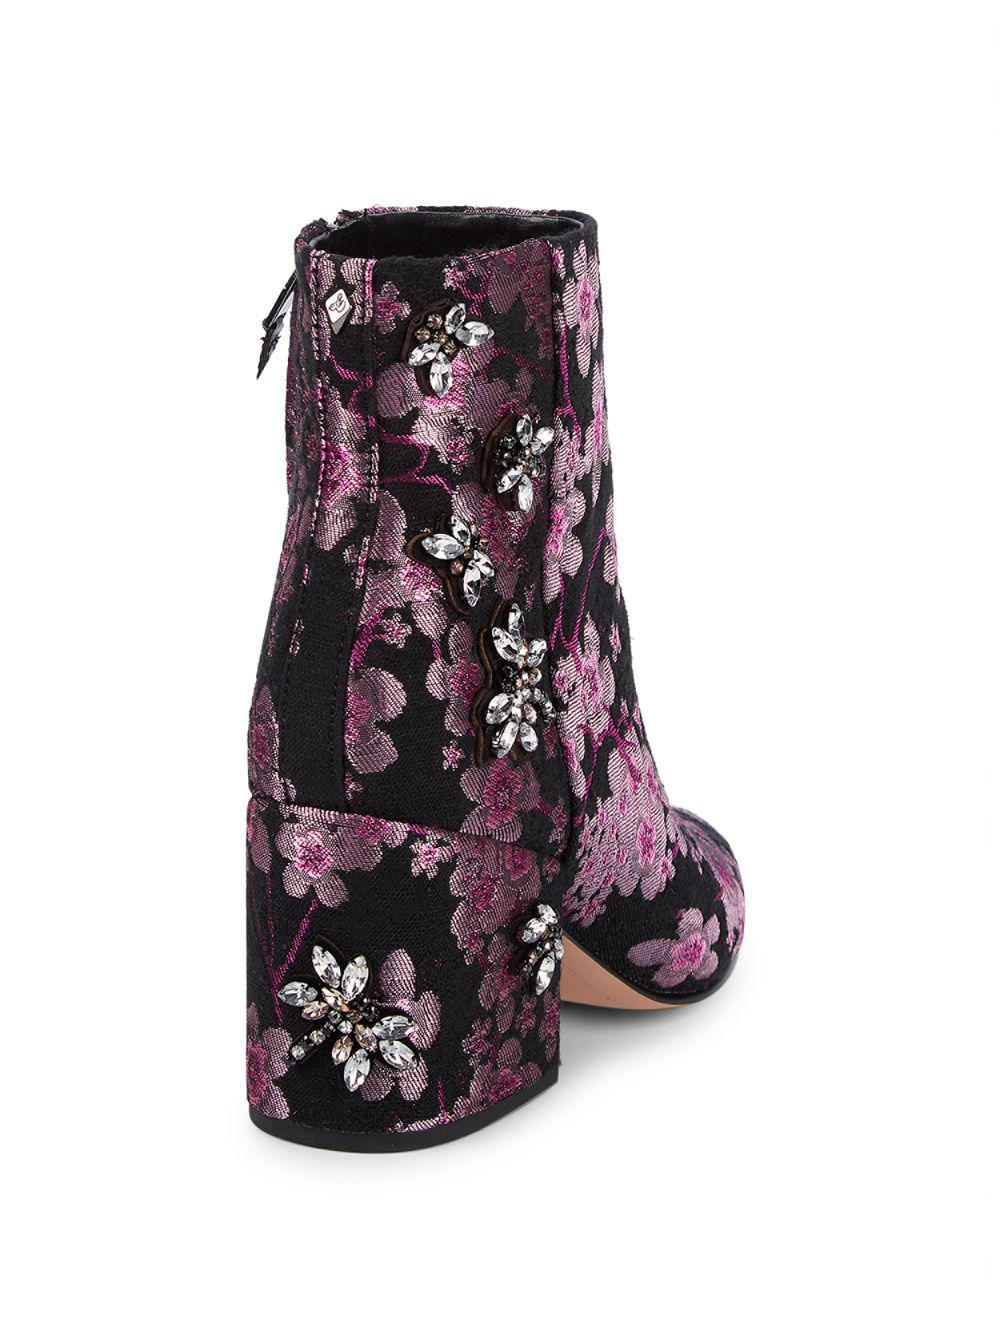 7af690b9e5ad Lyst - Sam Edelman Taye Embellished Brocade Ankle Boots in Pink